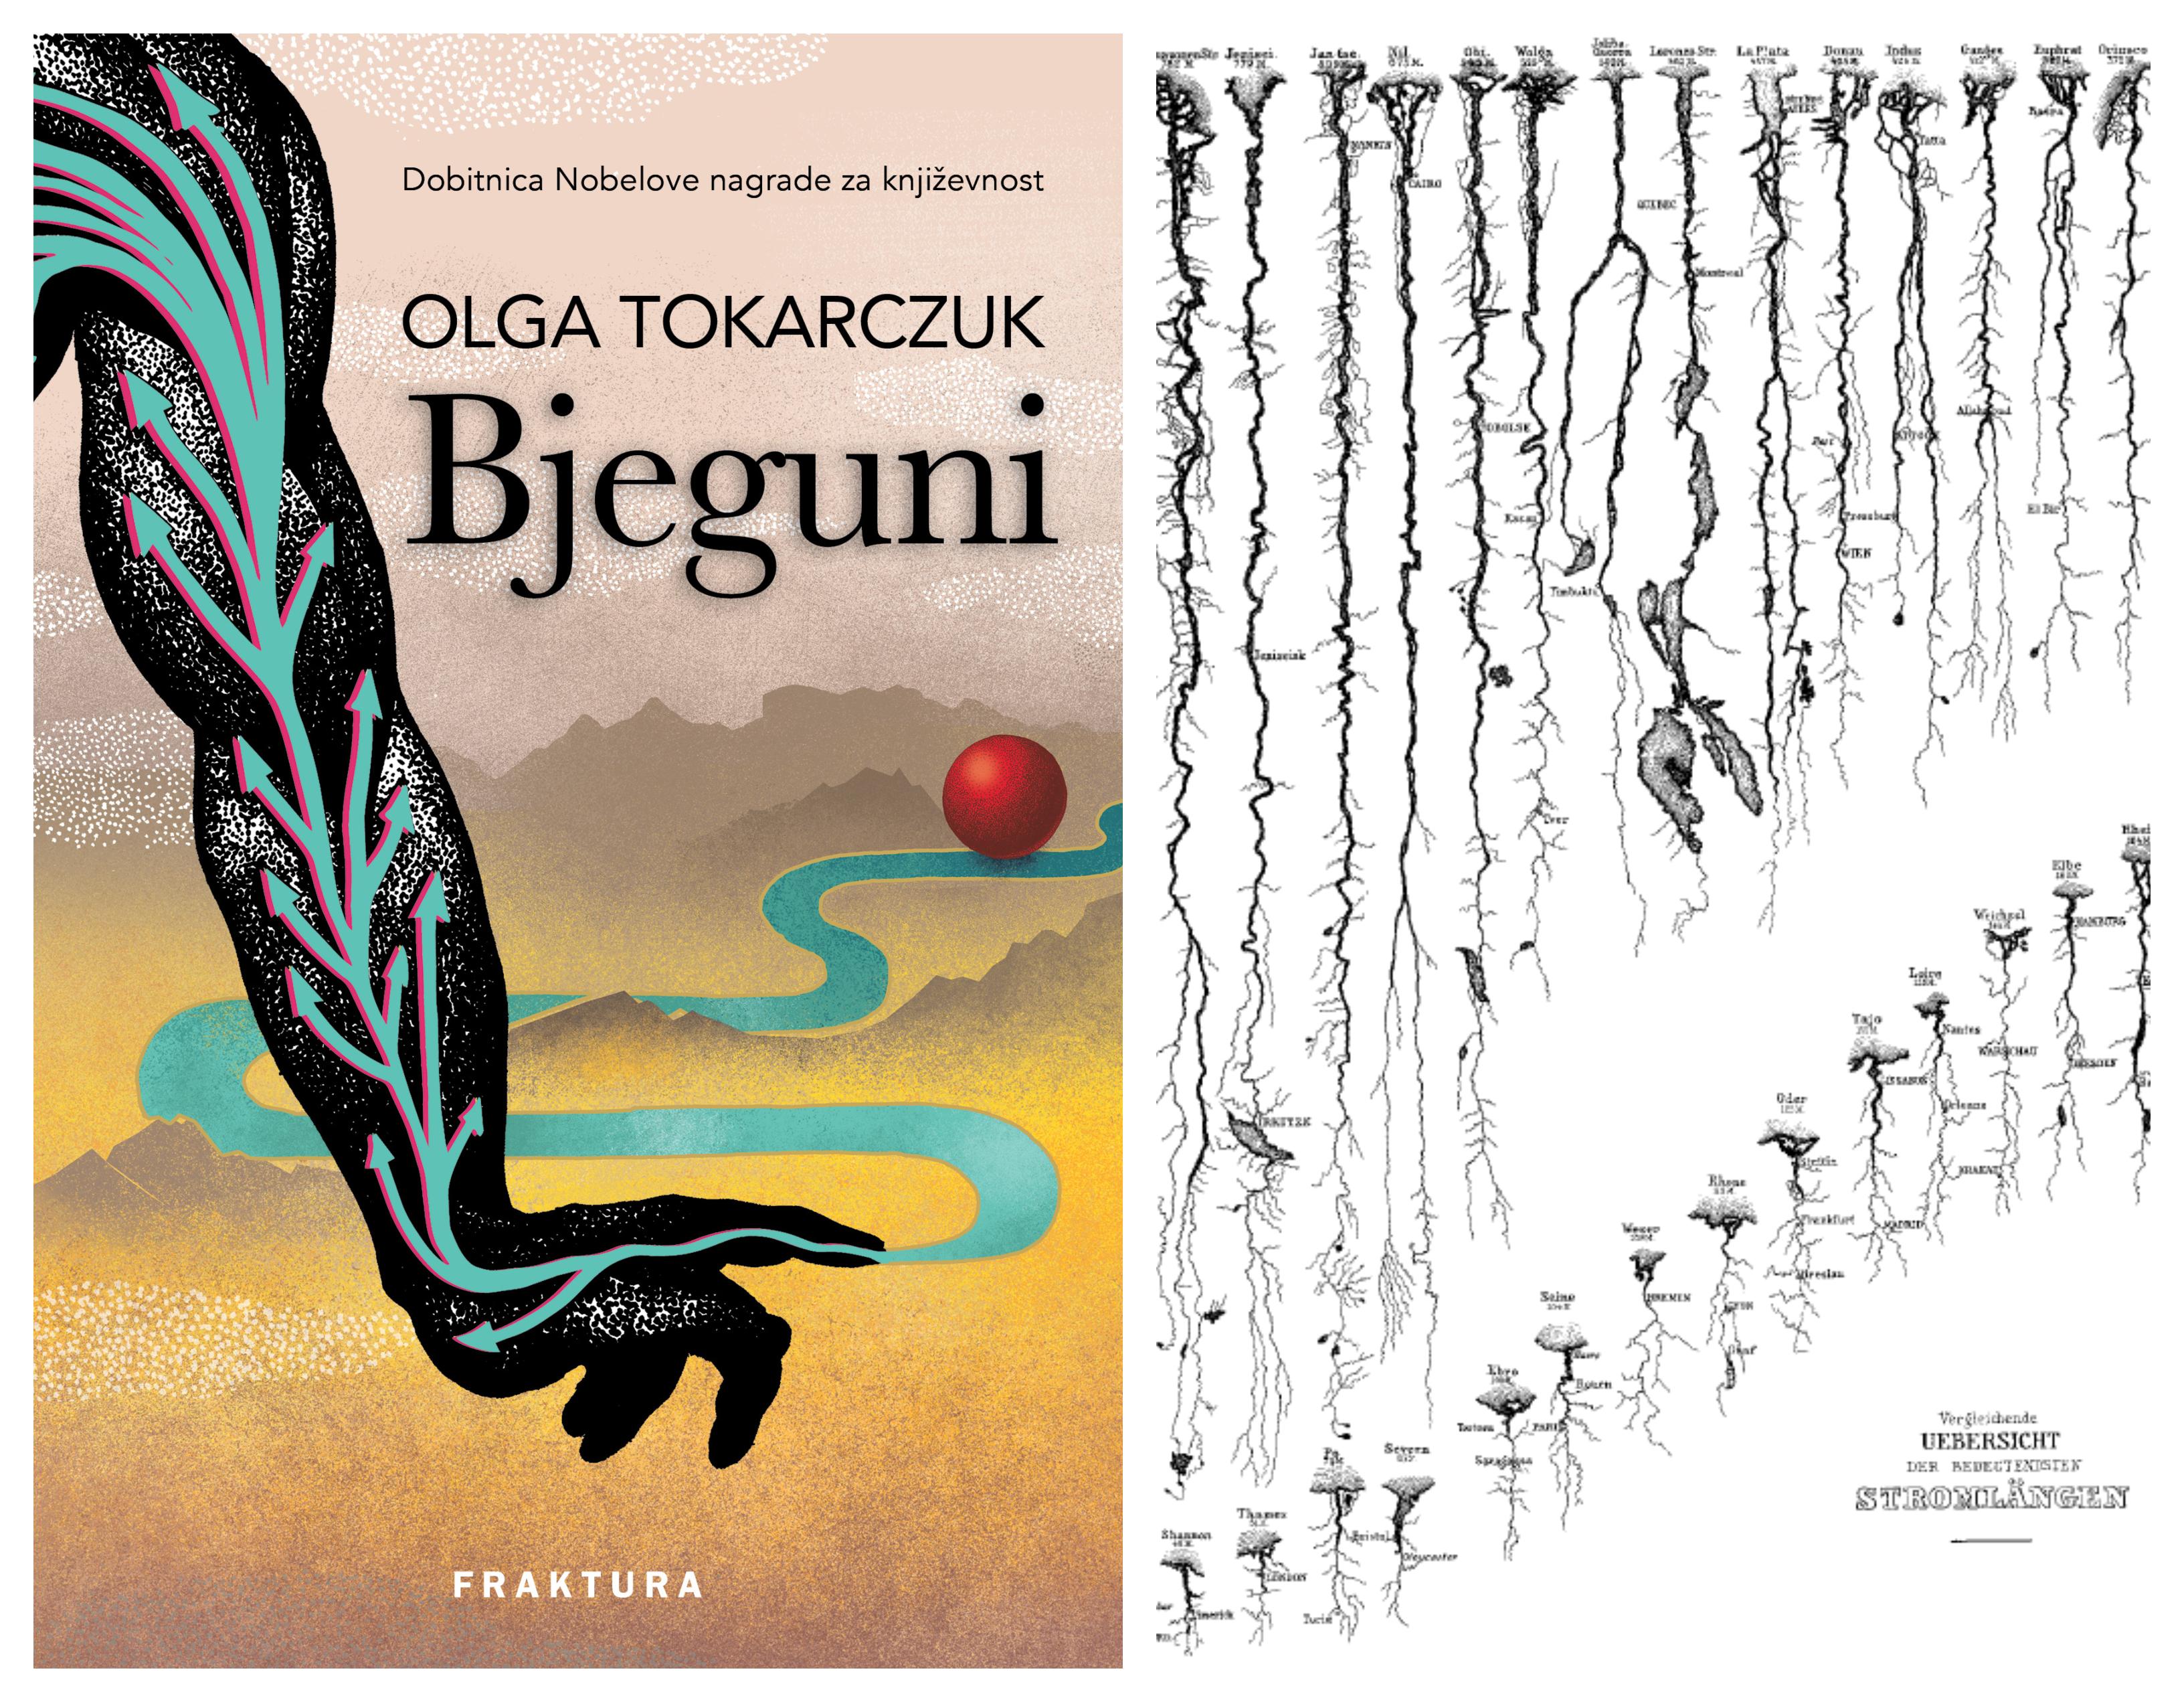 Olga Tokarczuk: Svijet u glavi (odlomak iz romana